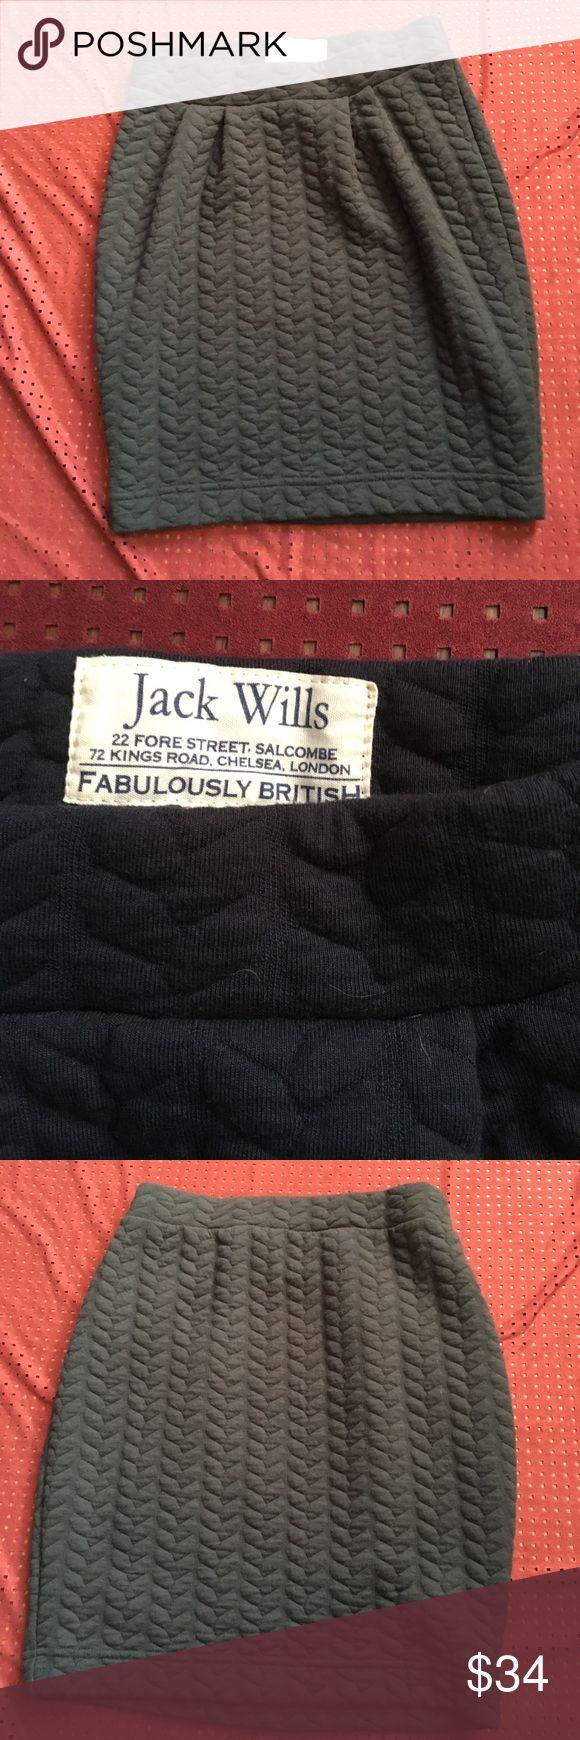 Jack wills heavy knit pencil skirt 59% polyester 34% cotton EUC navy Jack Wills Skirts Pencil